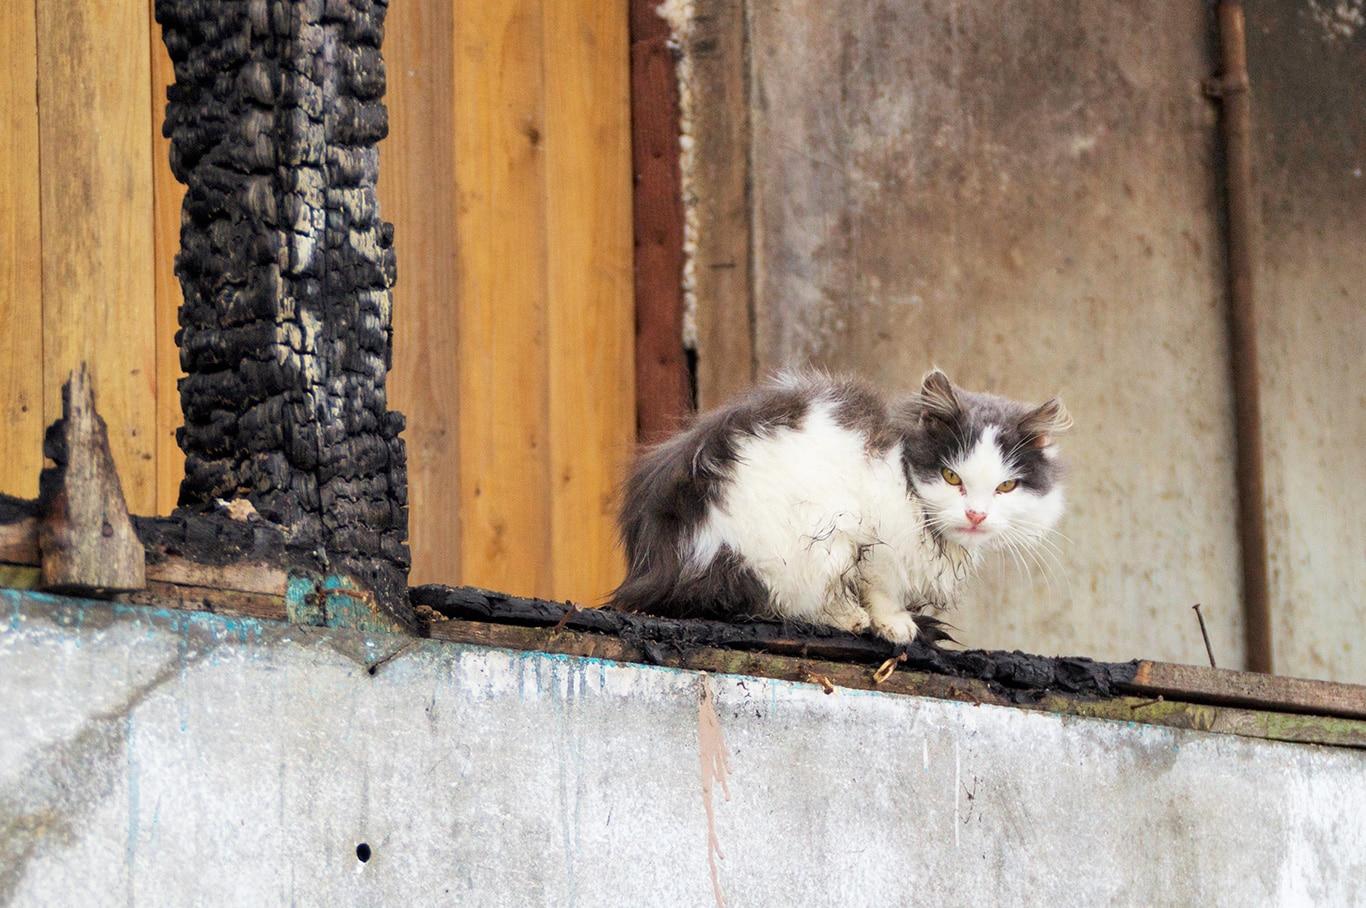 UNPRECEDENTED West Coast FIRES CONTINUE TO RAGE!Animals in MORTAL DANGER! 3